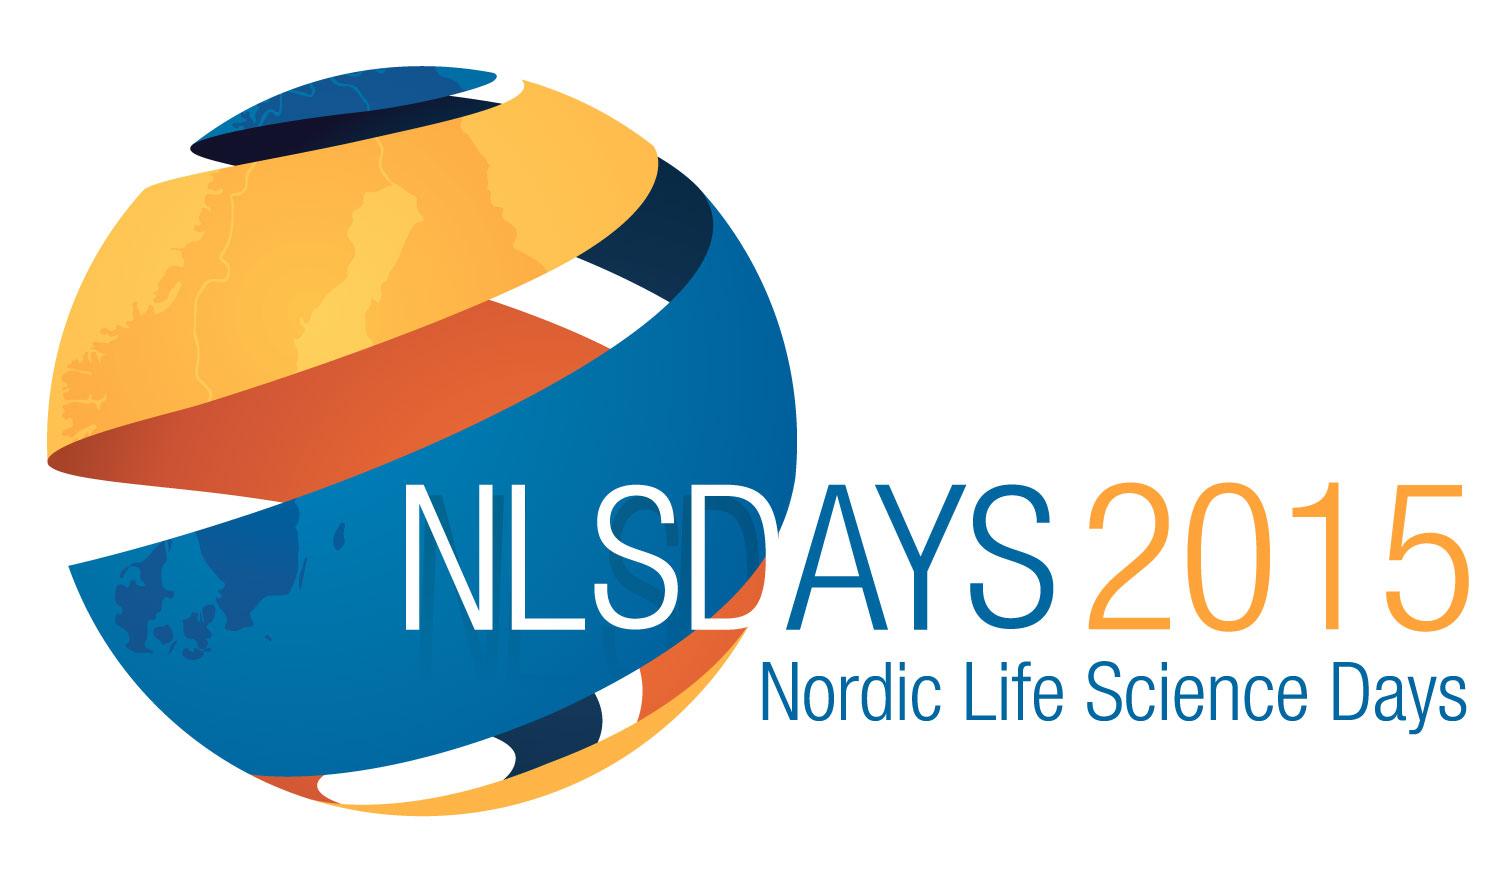 innokasmedical_fairs_events_NLSD_2015-1.jpg